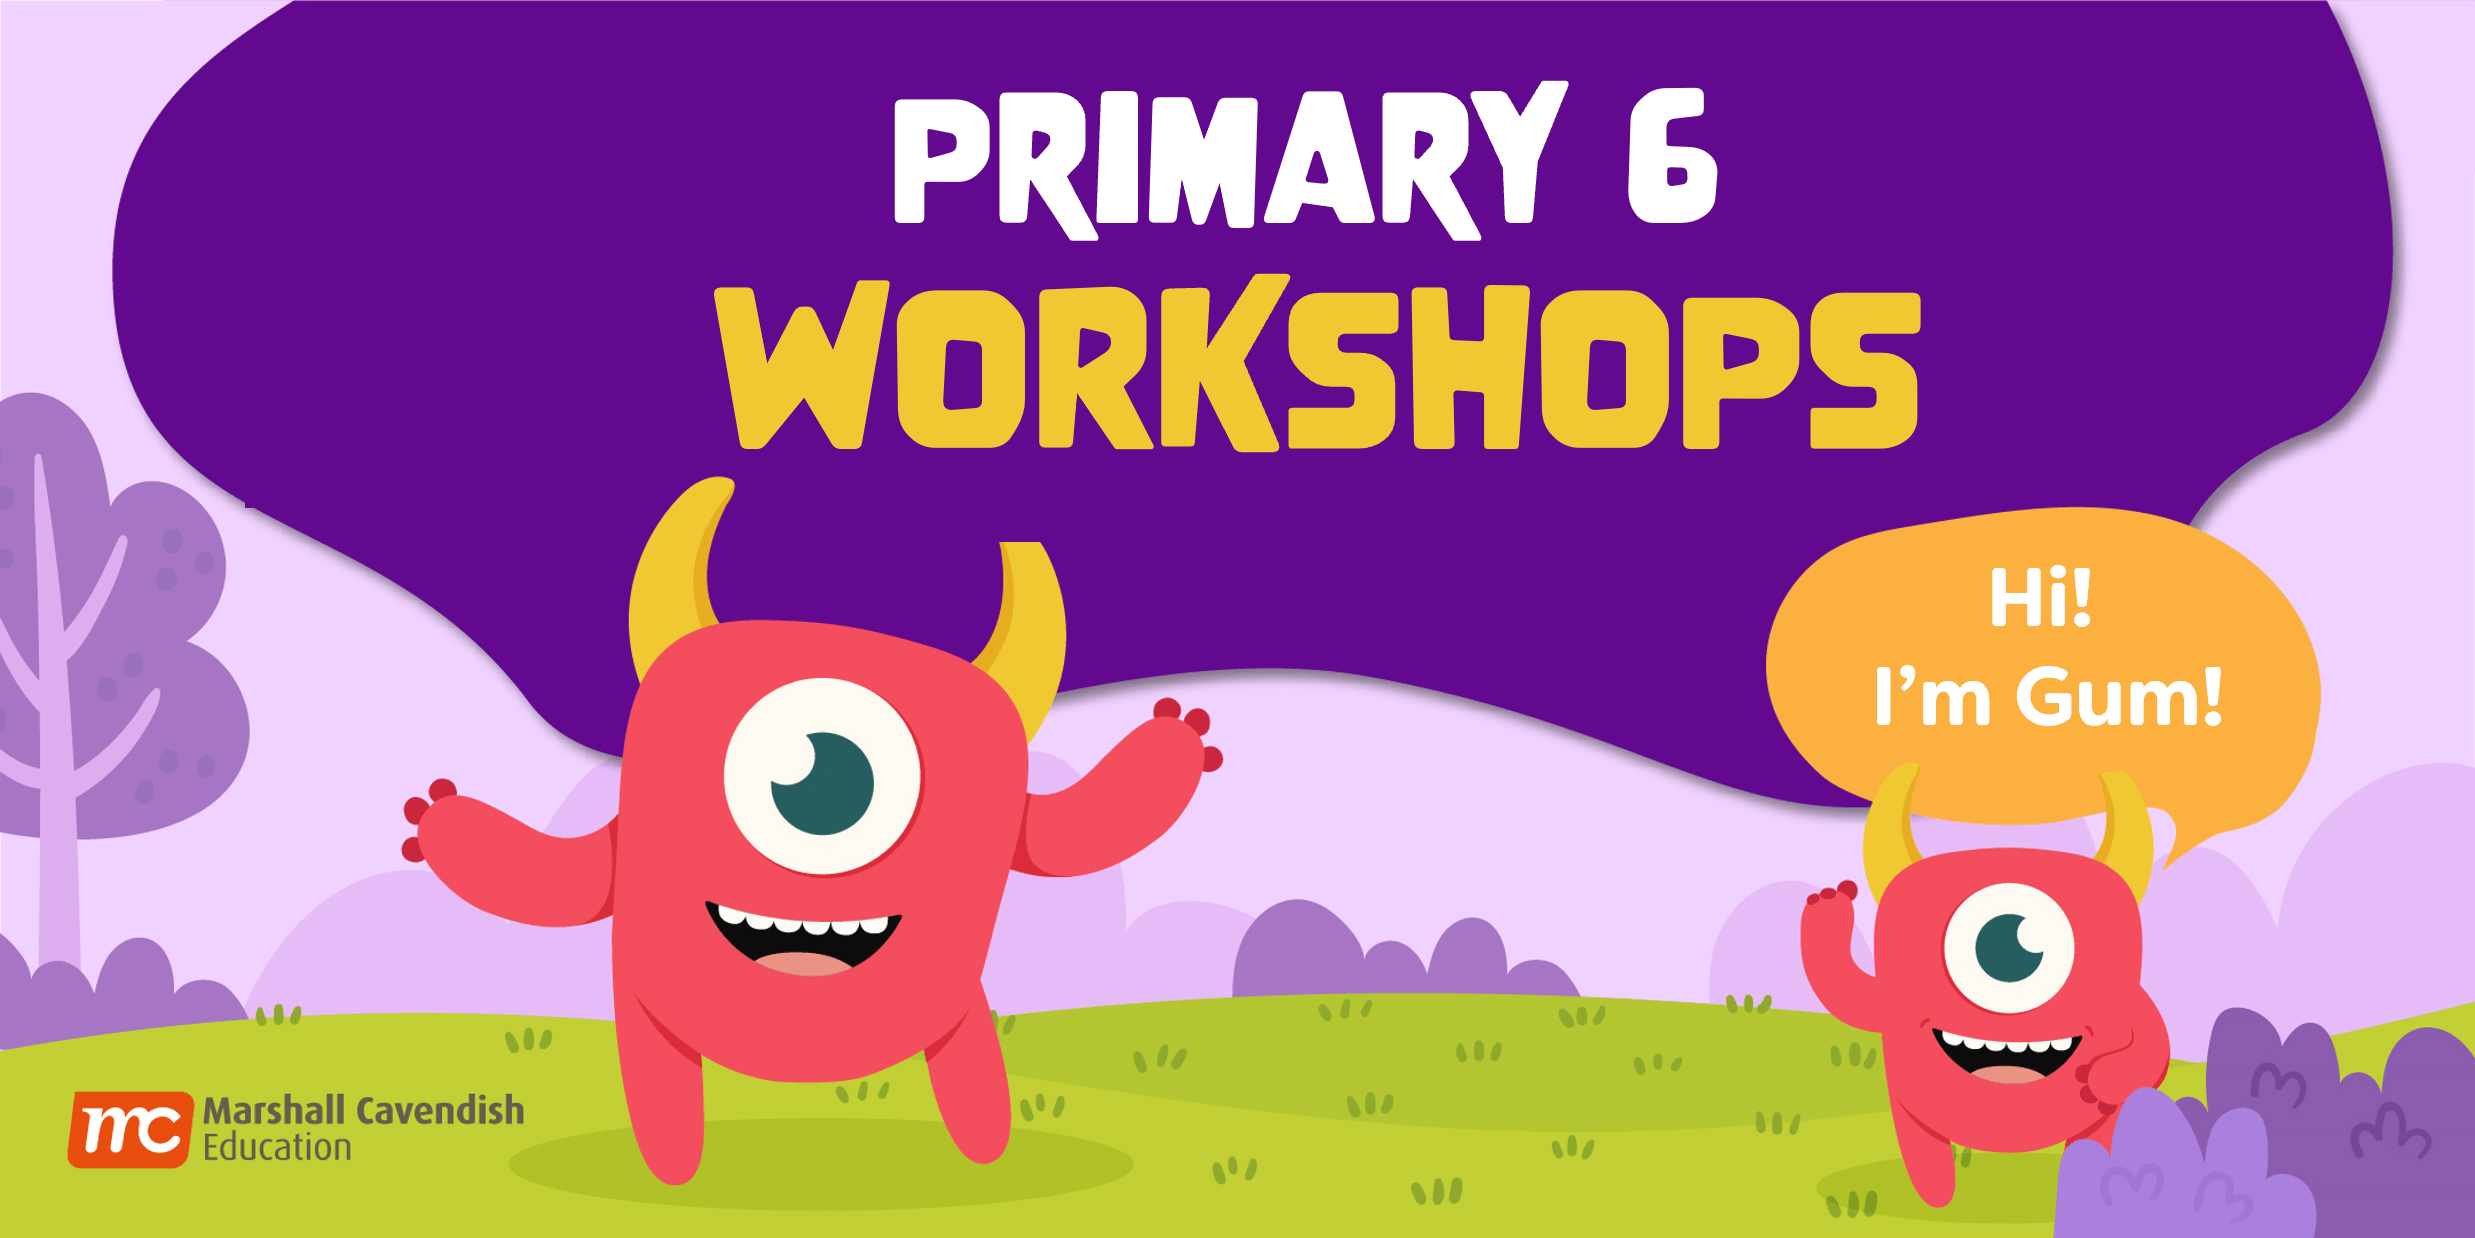 Primary 6 Workshops